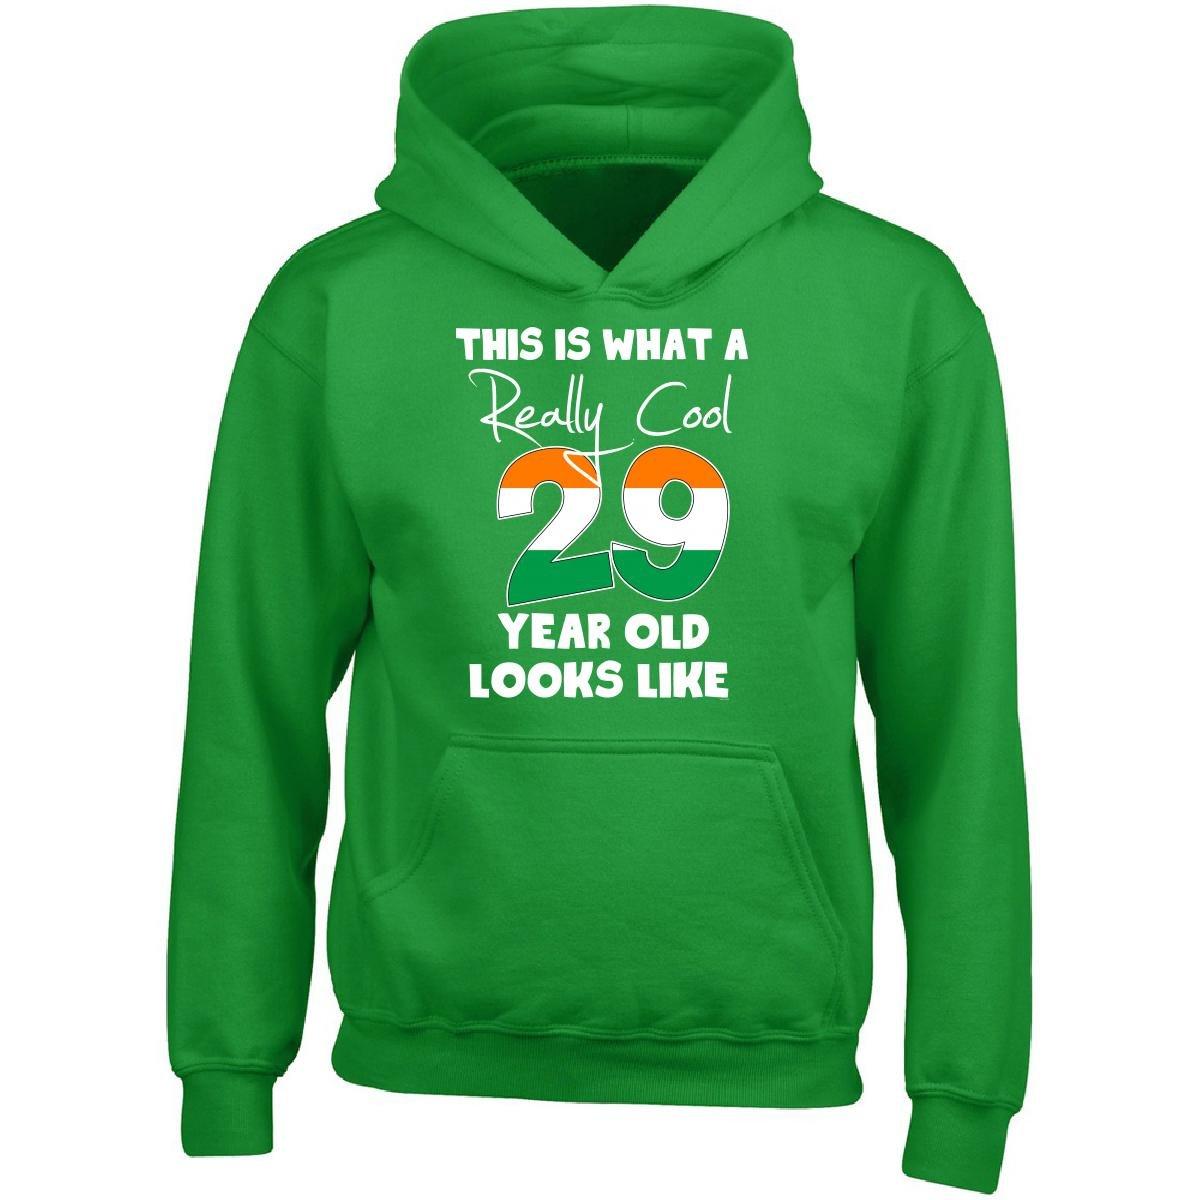 Adult Hoodie BADASS REPUBLIC Irish 29th Birthday Gift Ideas For Men Or Woman